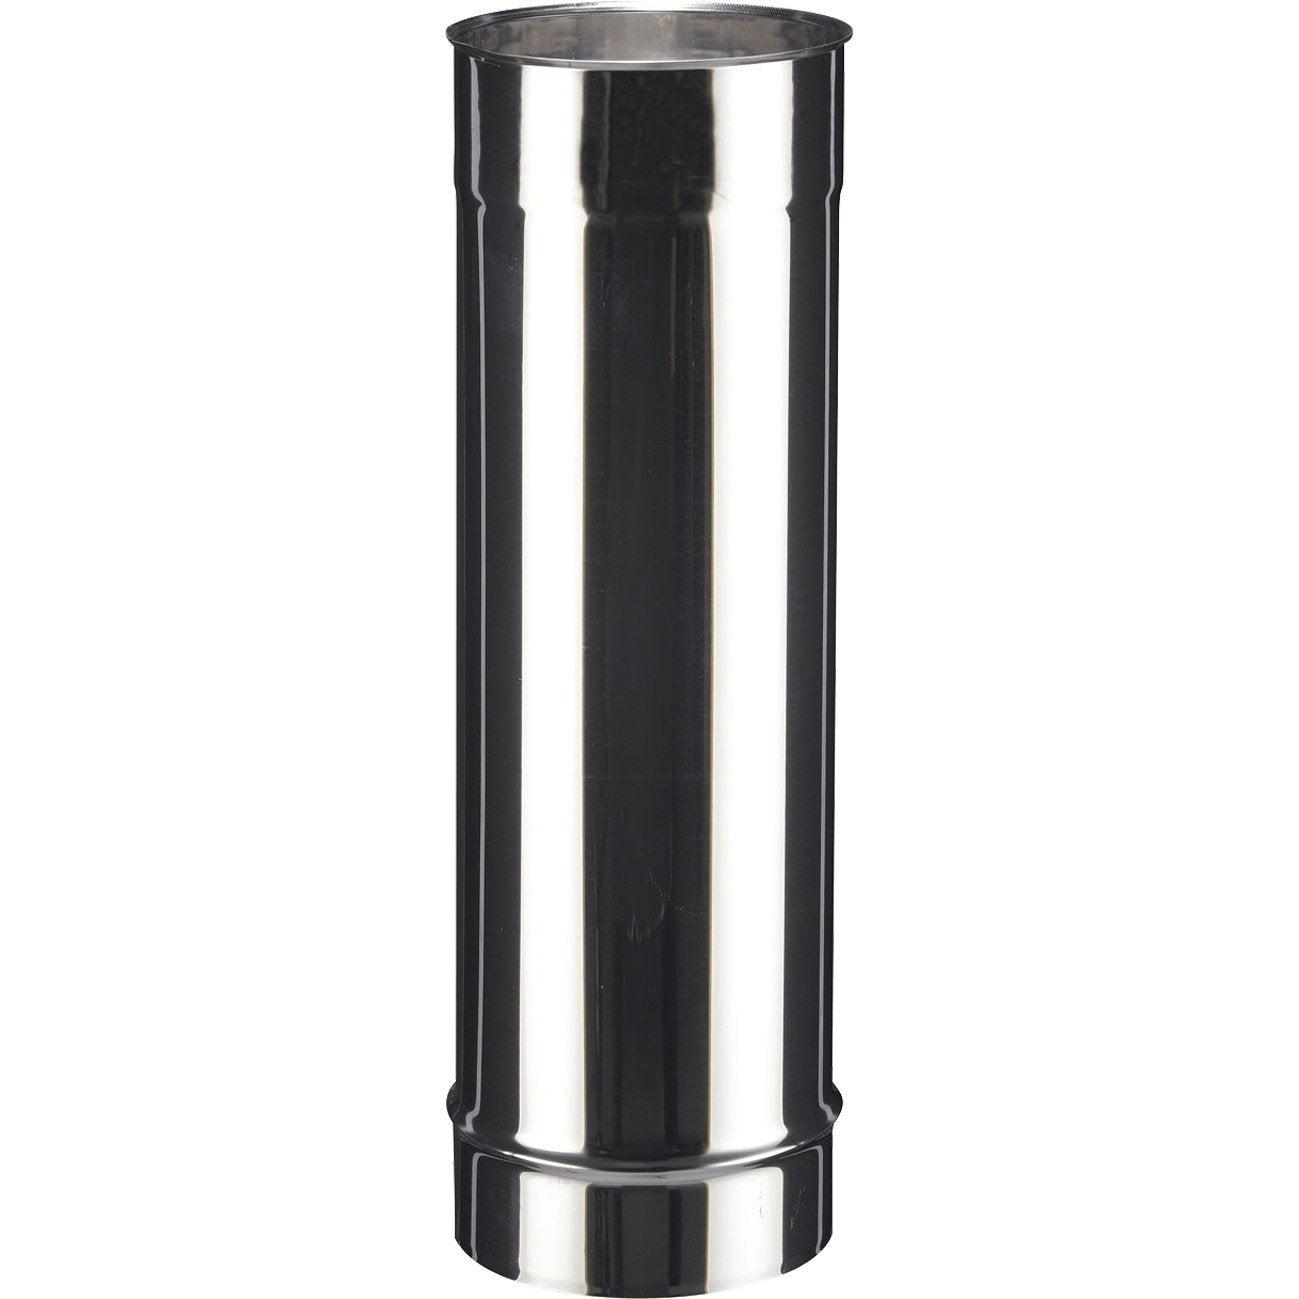 tuyau inox de raccordement poujoulat diam 150 mm 50 cm leroy merlin. Black Bedroom Furniture Sets. Home Design Ideas